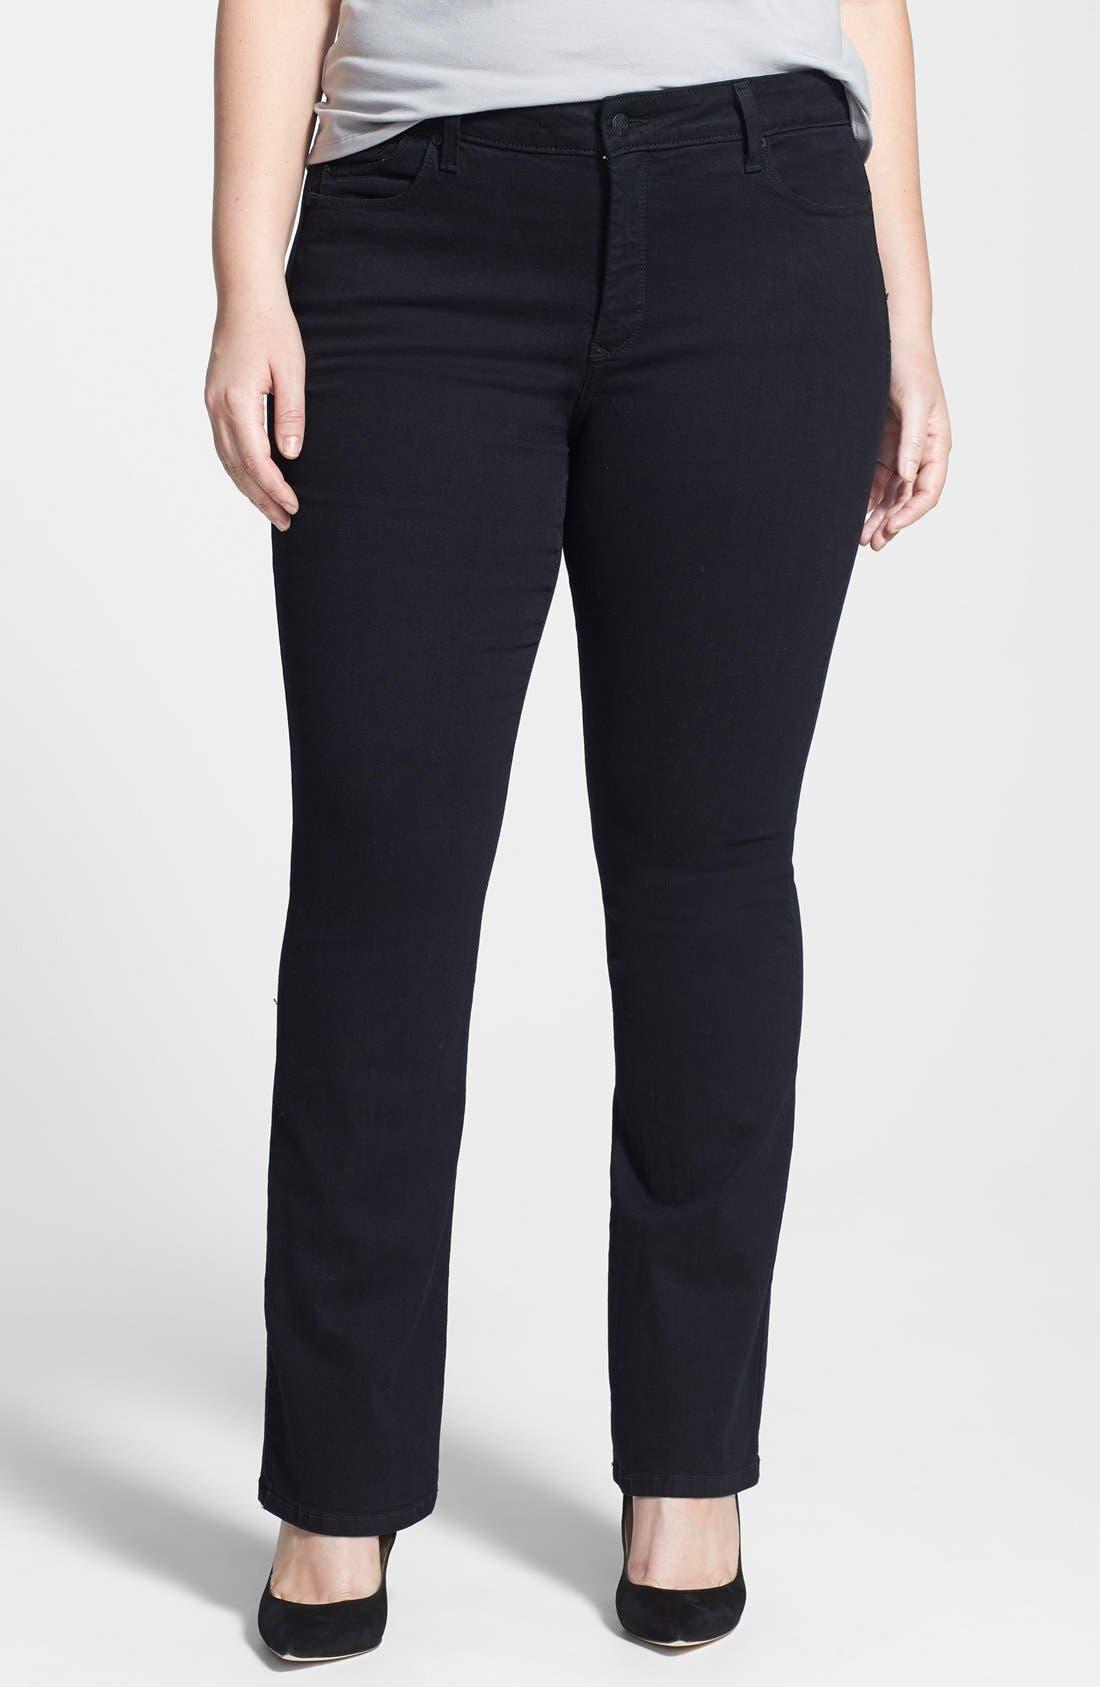 Main Image - NYDJ 'Billie' Stretch Mini Bootcut Jeans (Plus Size)